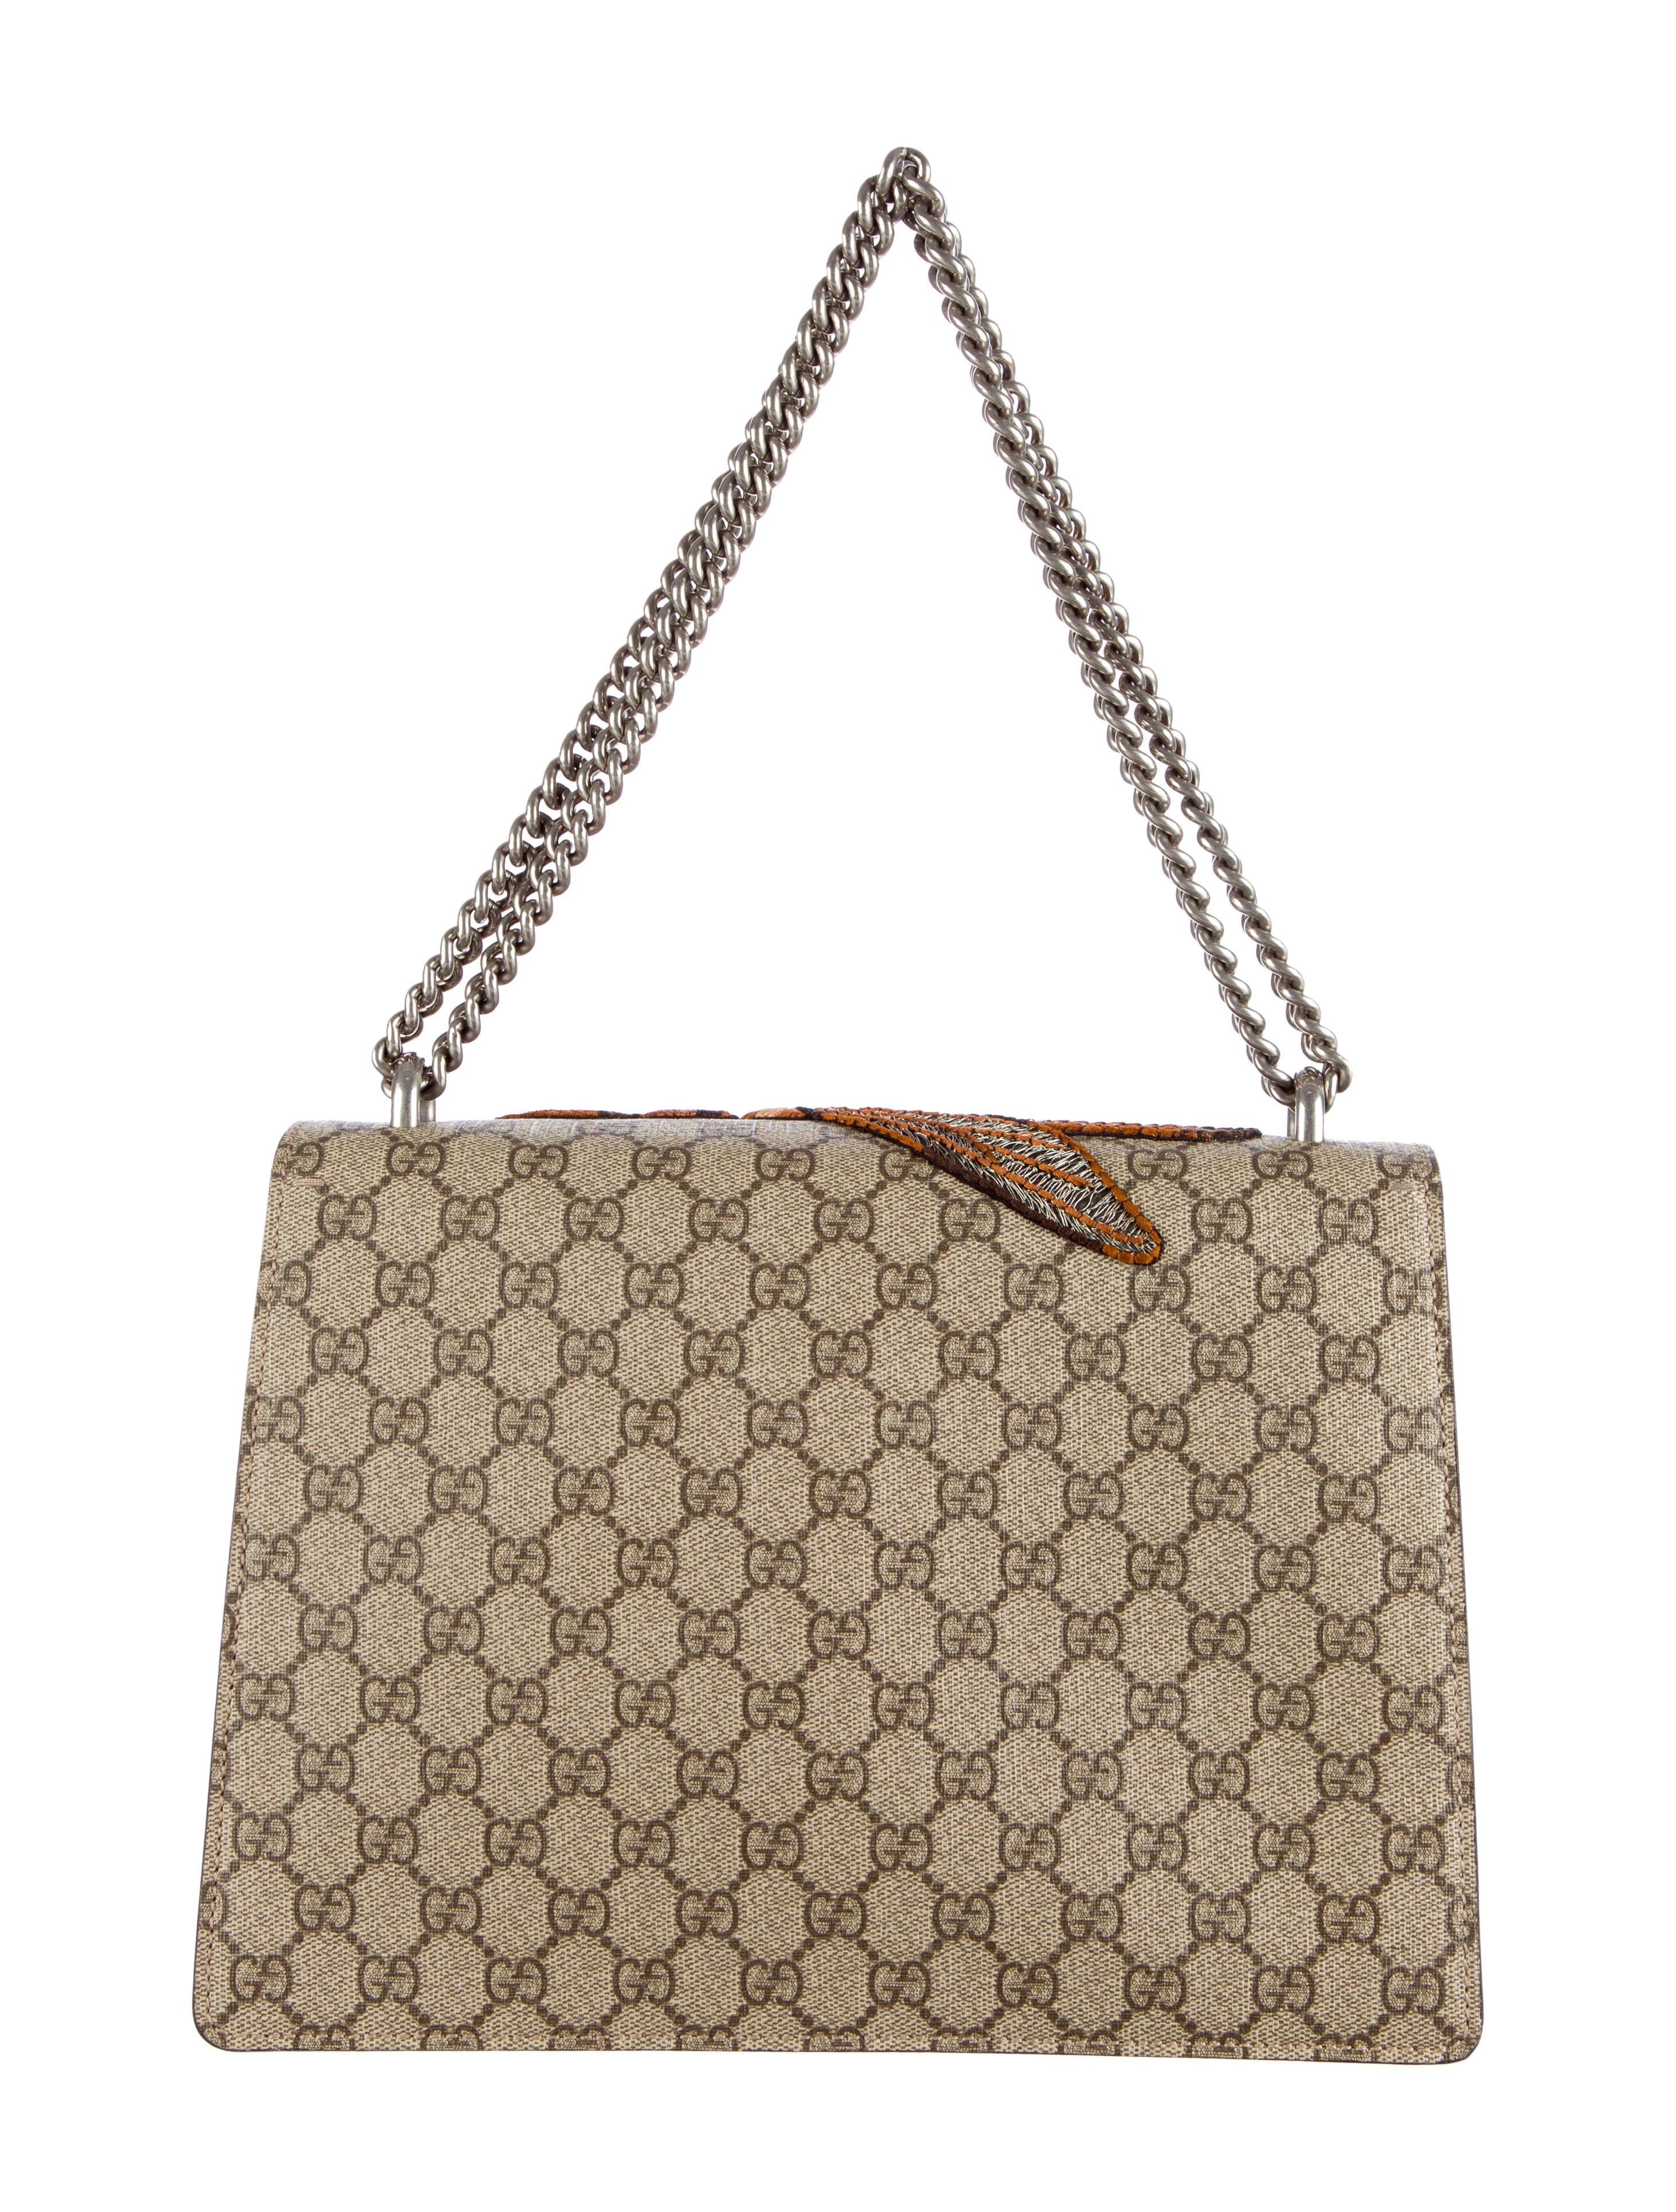 c276aae1526355 Gucci GG Supreme Dionysus Bag - Handbags - GUC77953   The RealReal. GUCCI  Dionysus Gg Small Velvet Shoulder ...